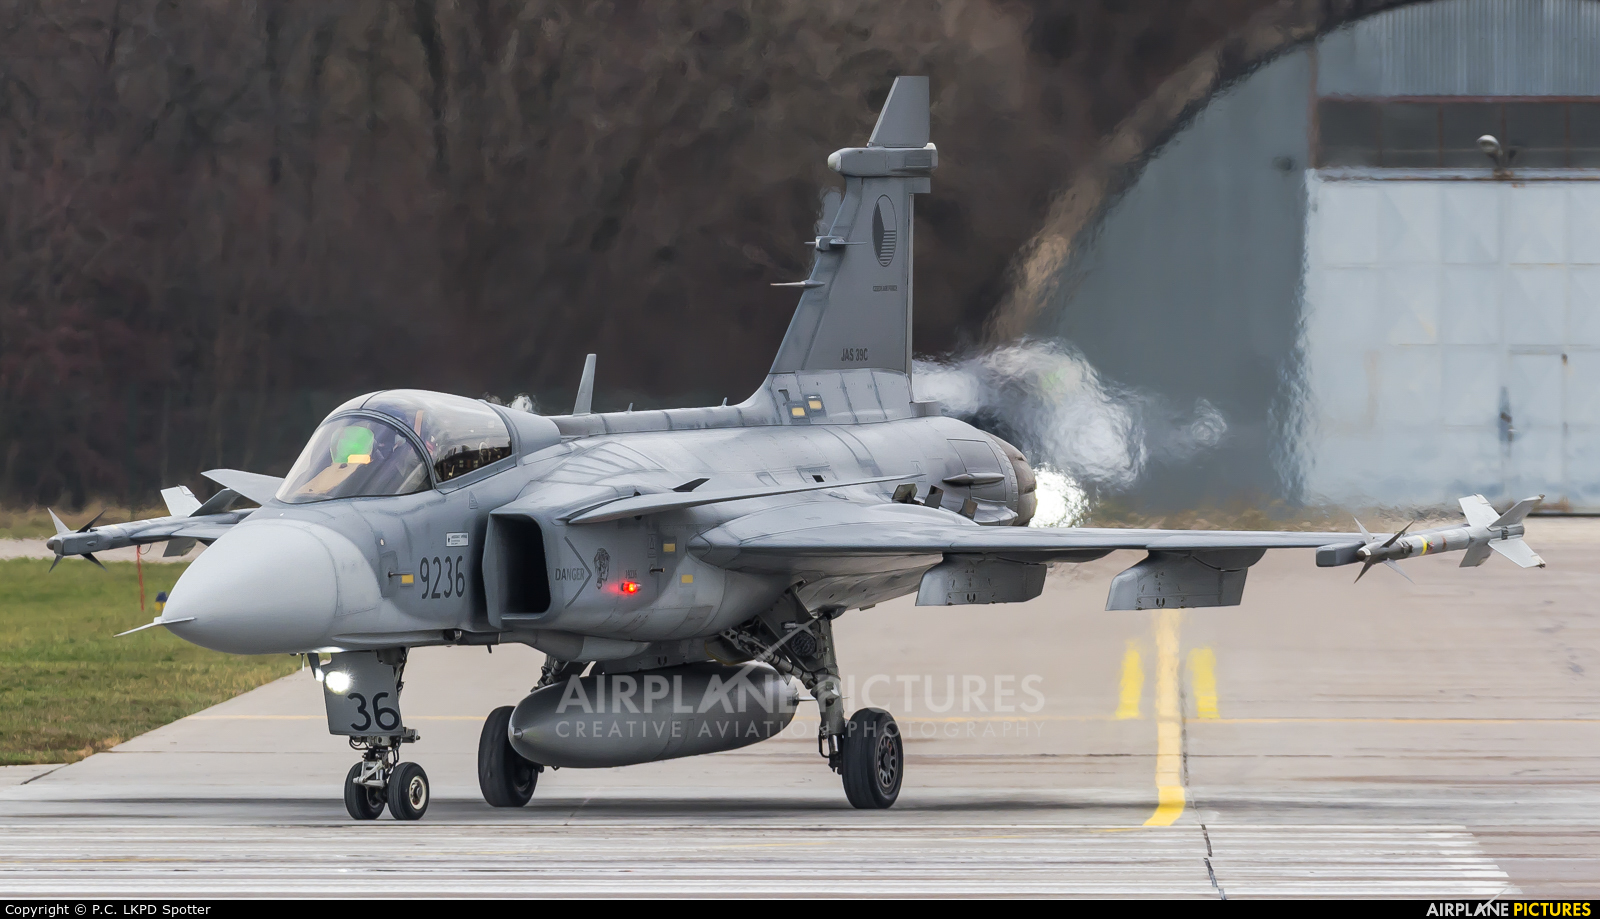 Czech - Air Force 9236 aircraft at Pardubice